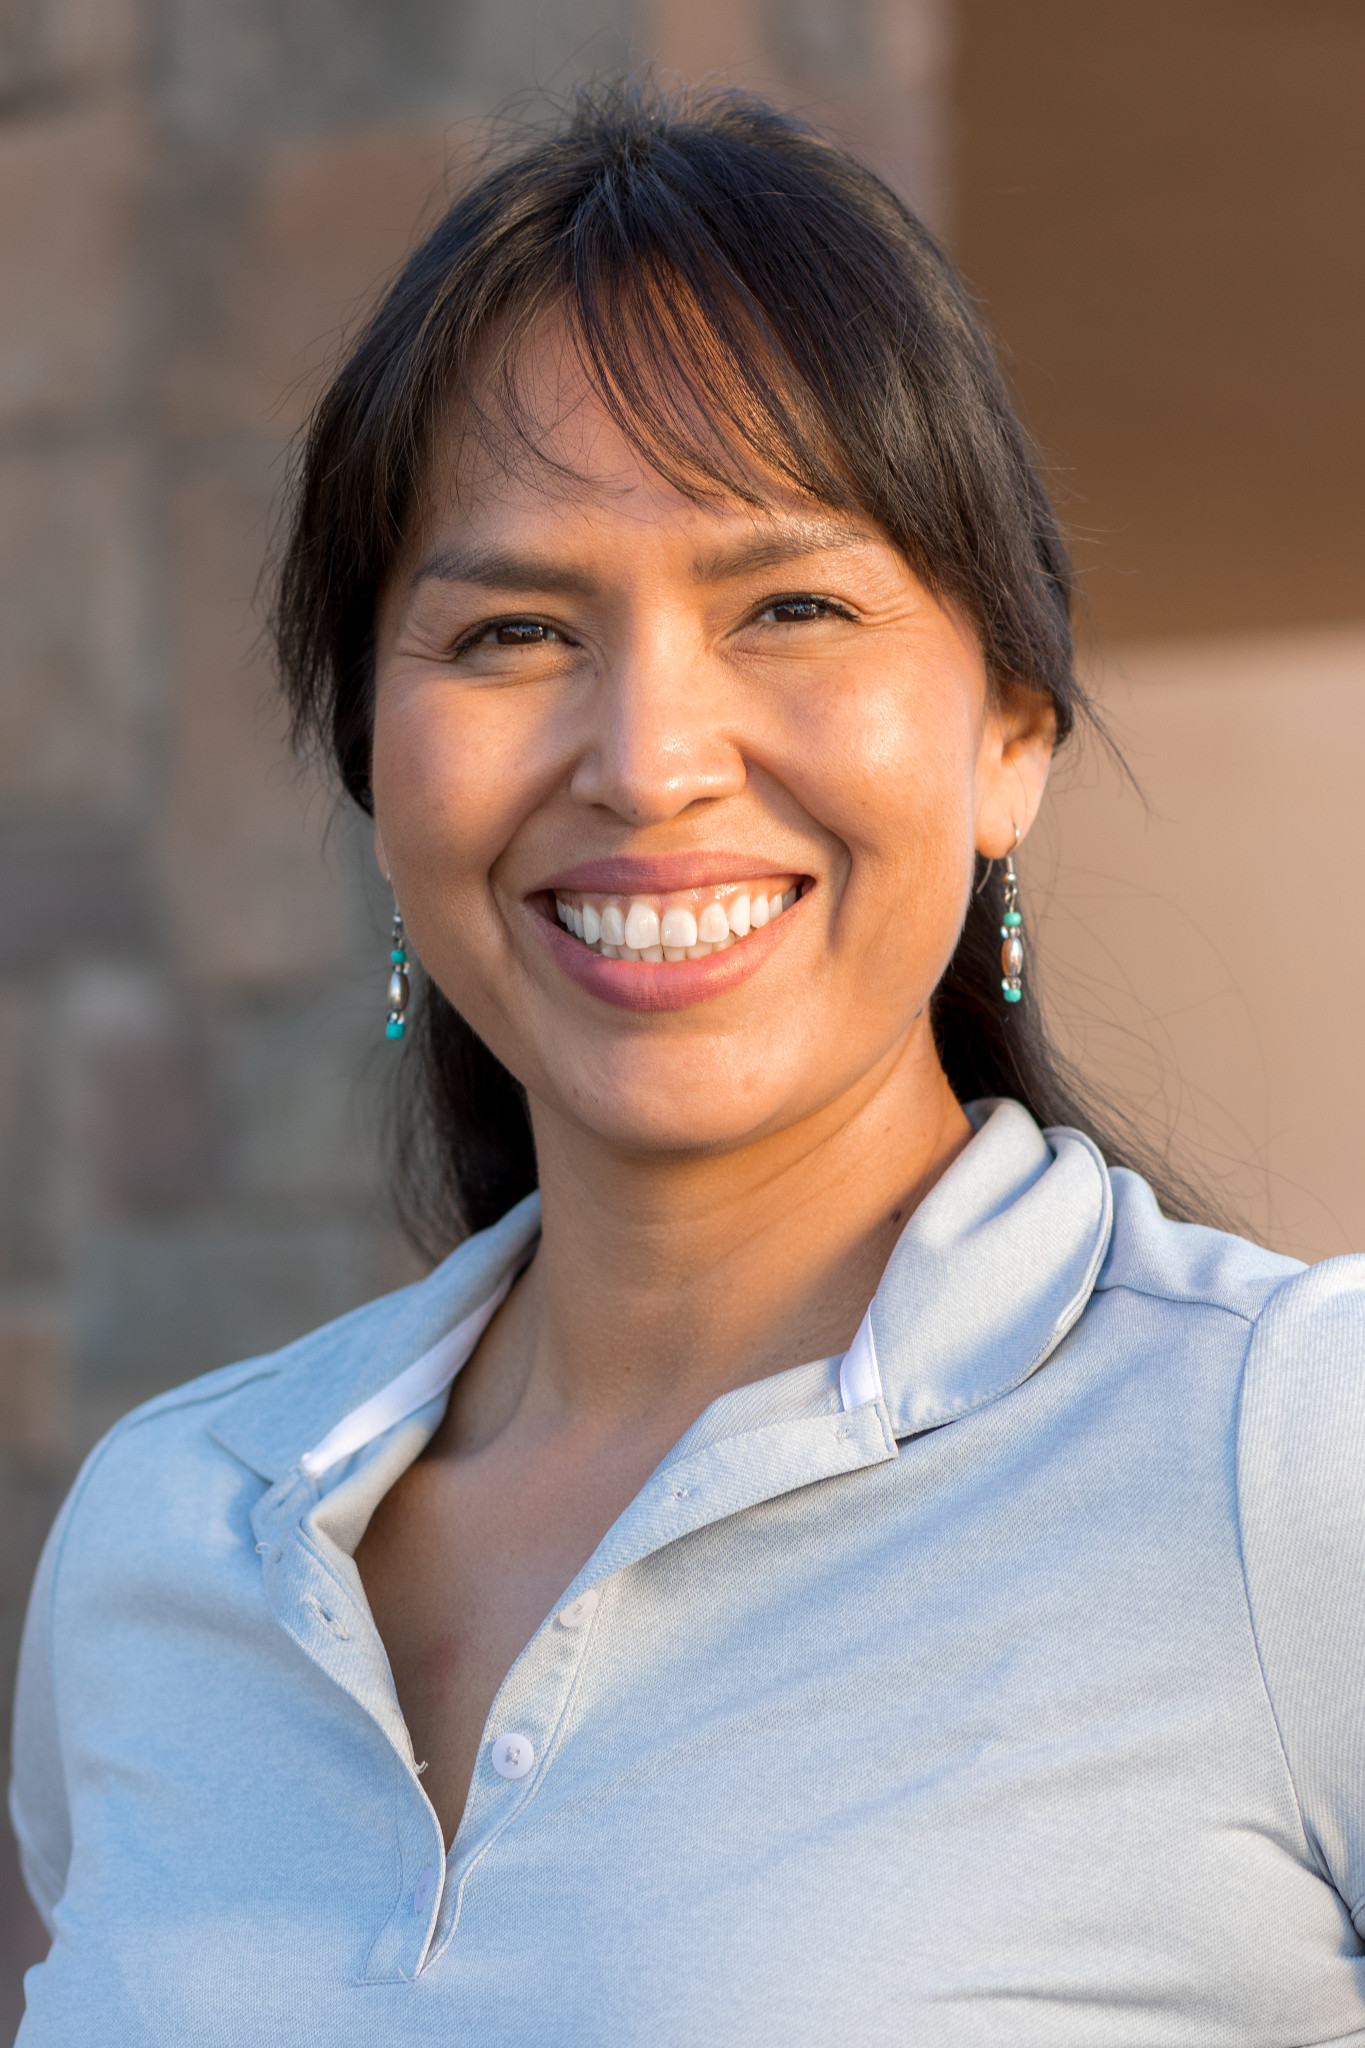 Brenda Charley - Program Coordinator